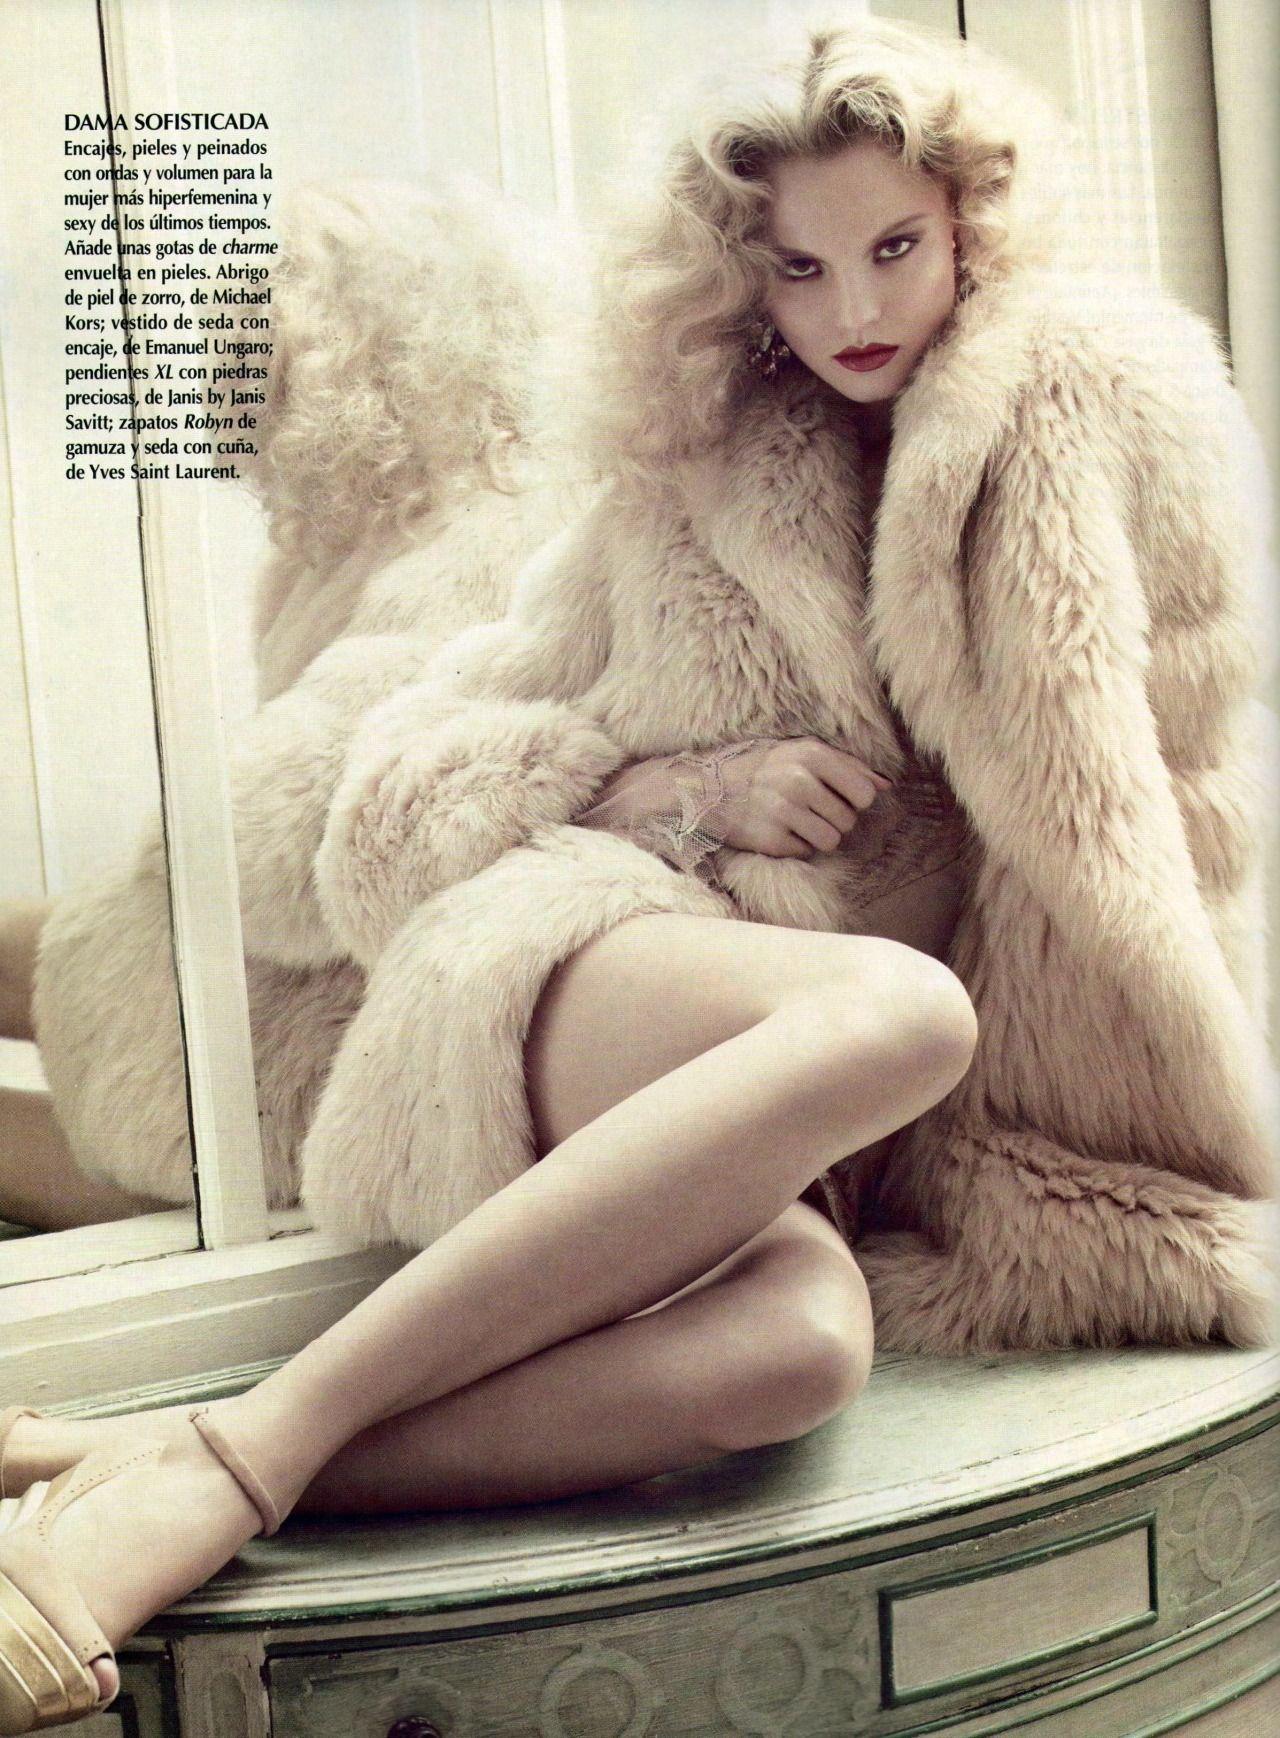 Magdalena Frackowiak by David Roemer for Vogue México, December 2011